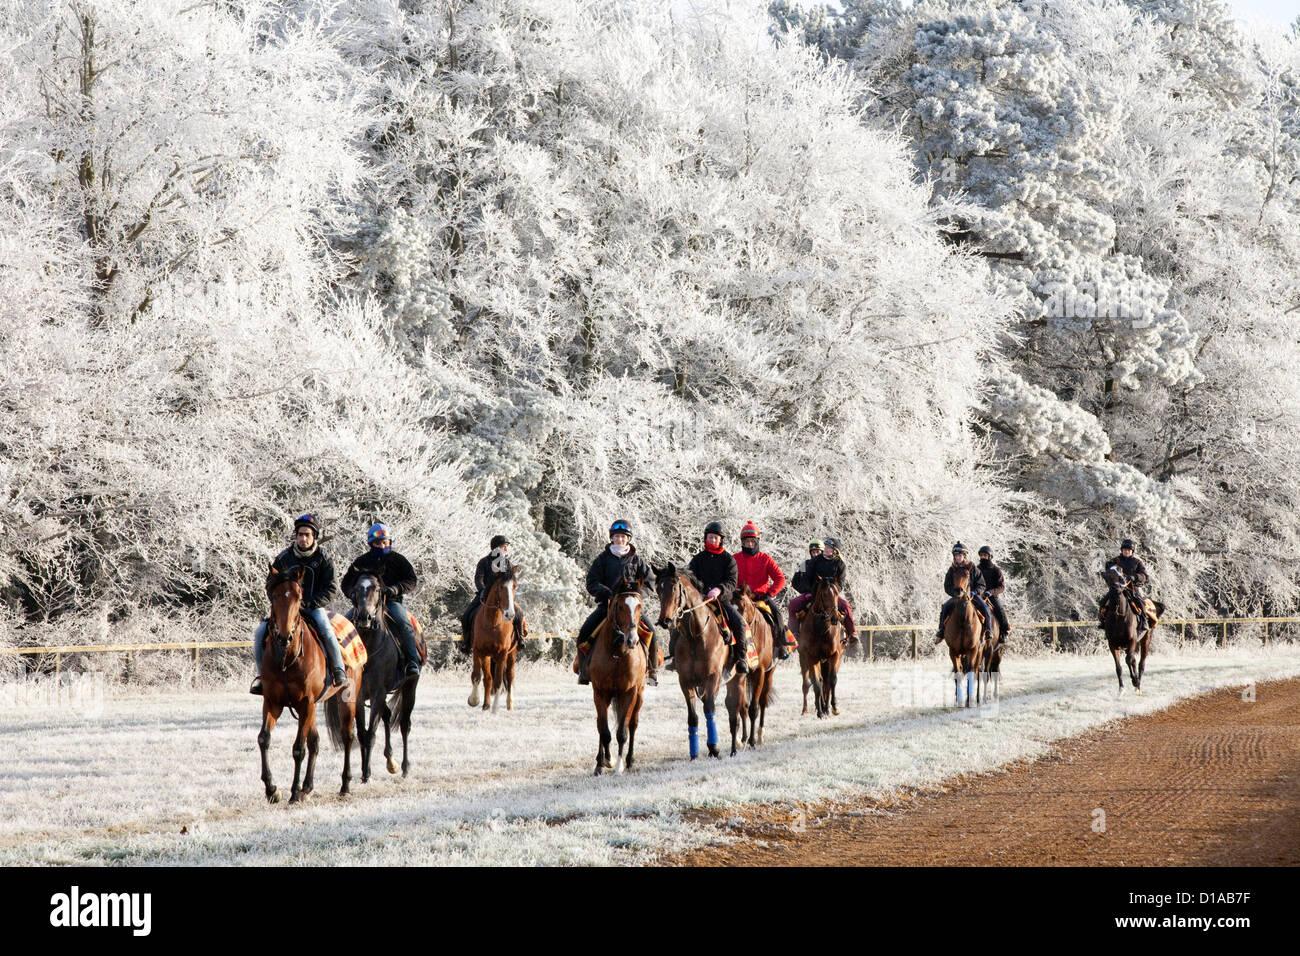 horses-and-jockeys-riding-on-a-frosty-wi